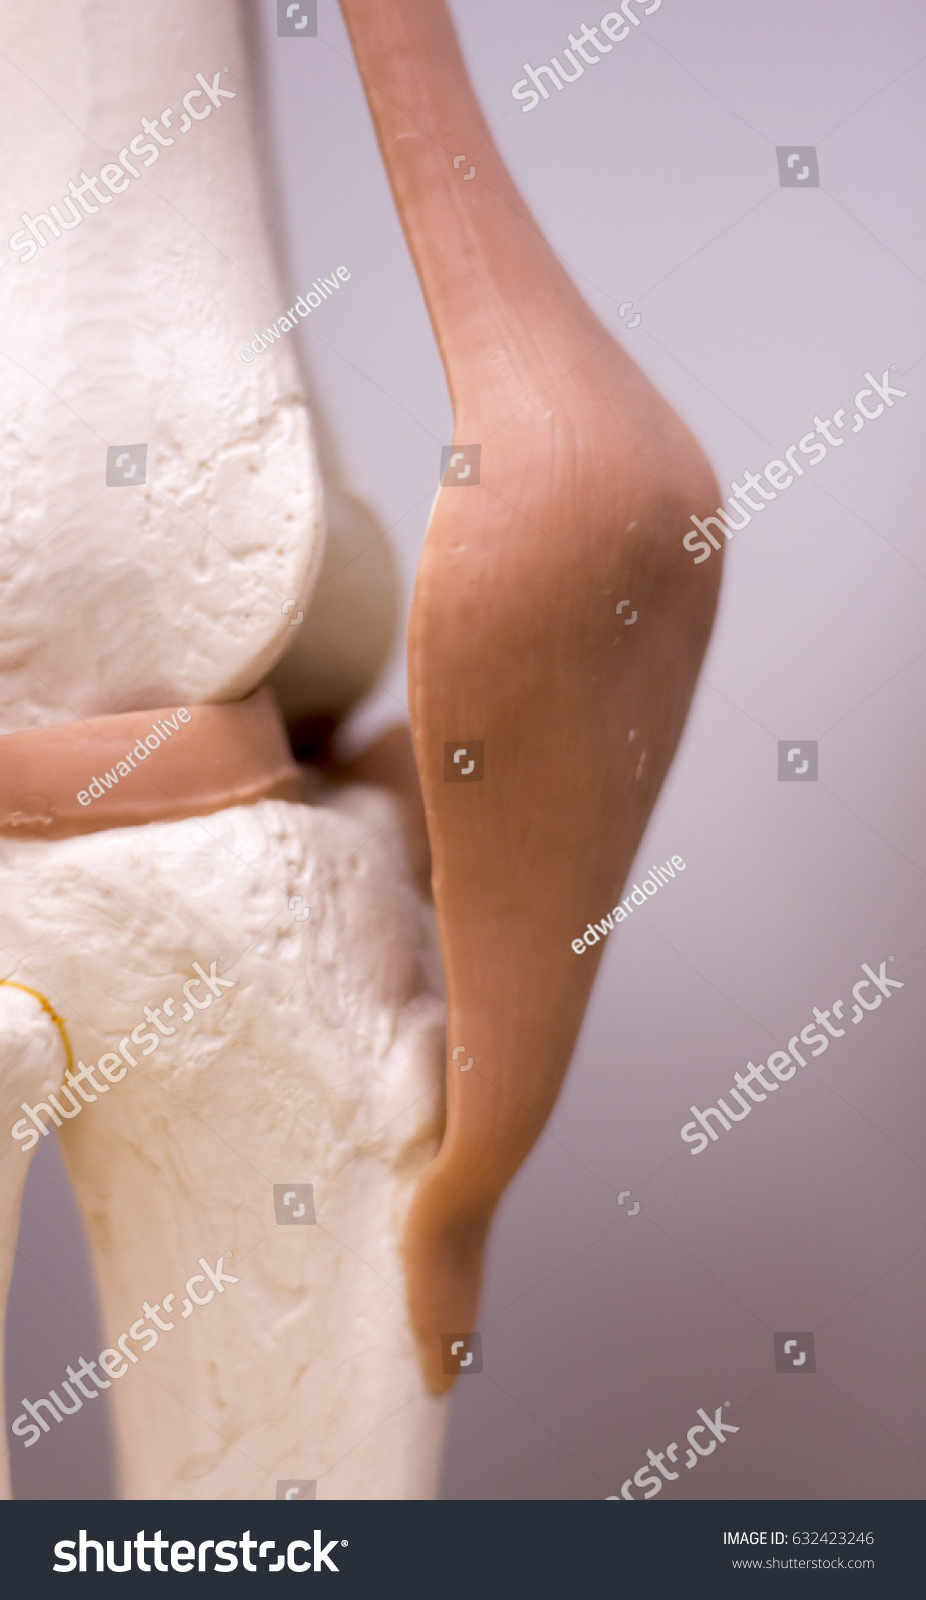 Knee Meniscus Medical Study Student Anatomy Stock Photo Edit Now